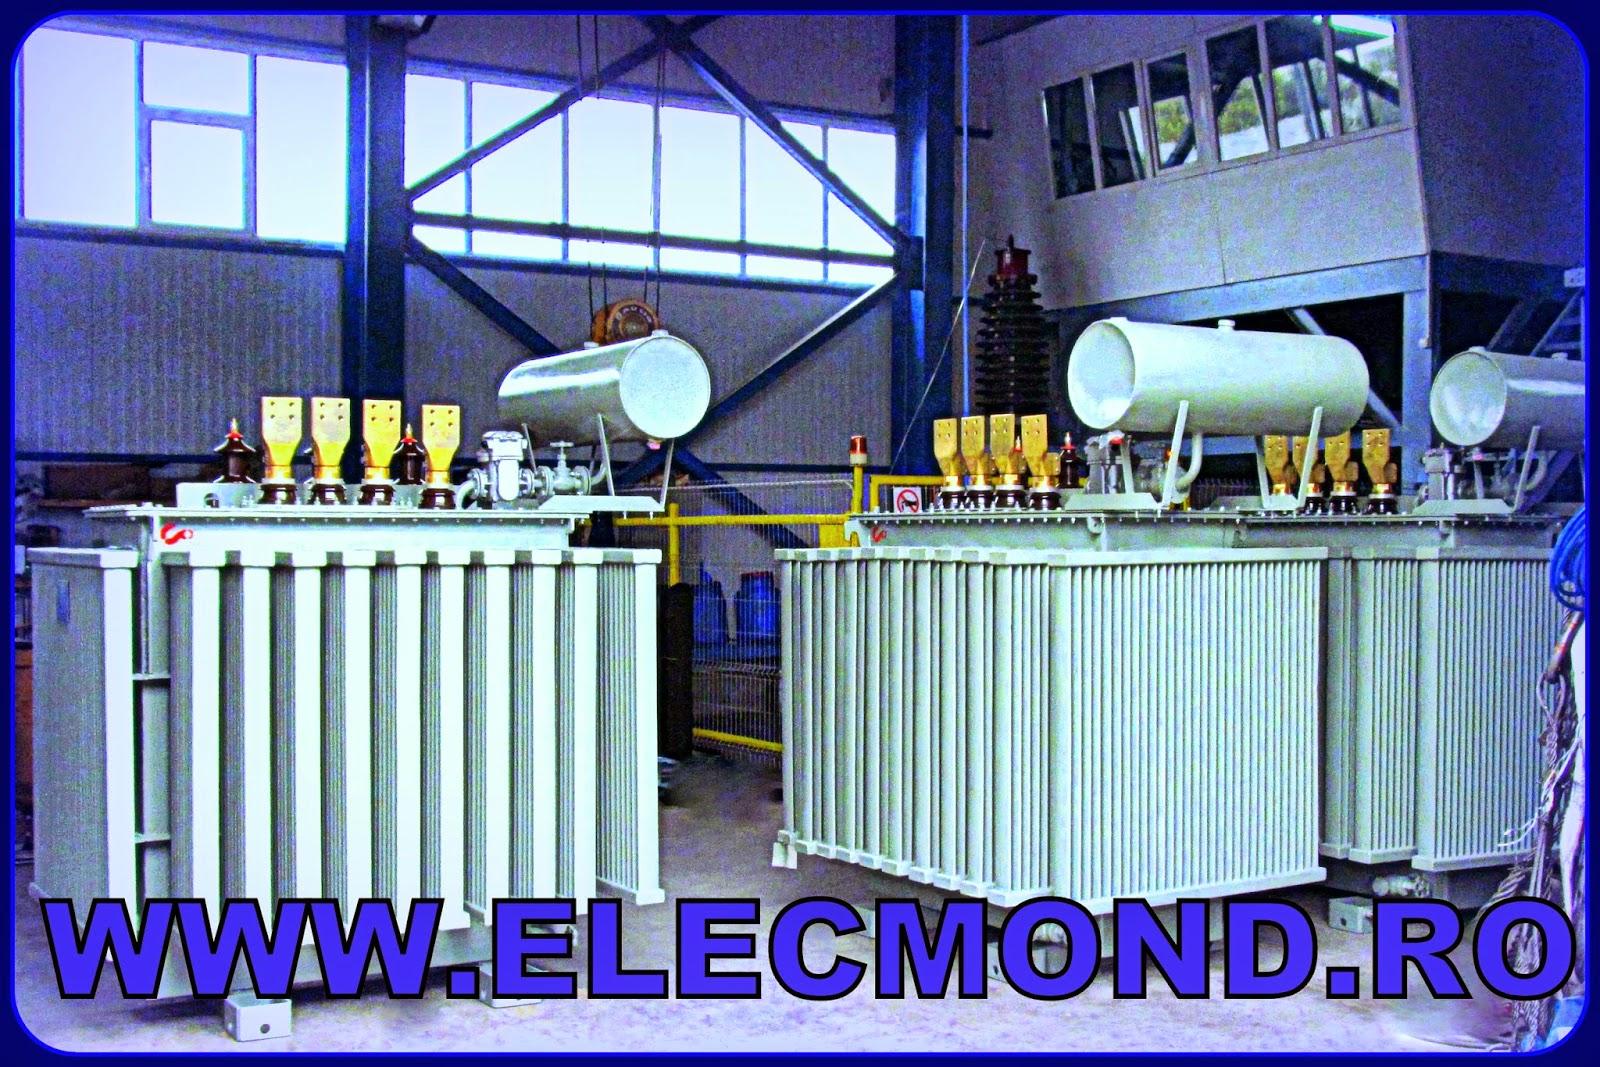 Transformatoare 1600 kVA 6/0,4 kV Cupru , transformator 1600 kVA Cupru  6/0,4 kV , Elecmond Electric ,